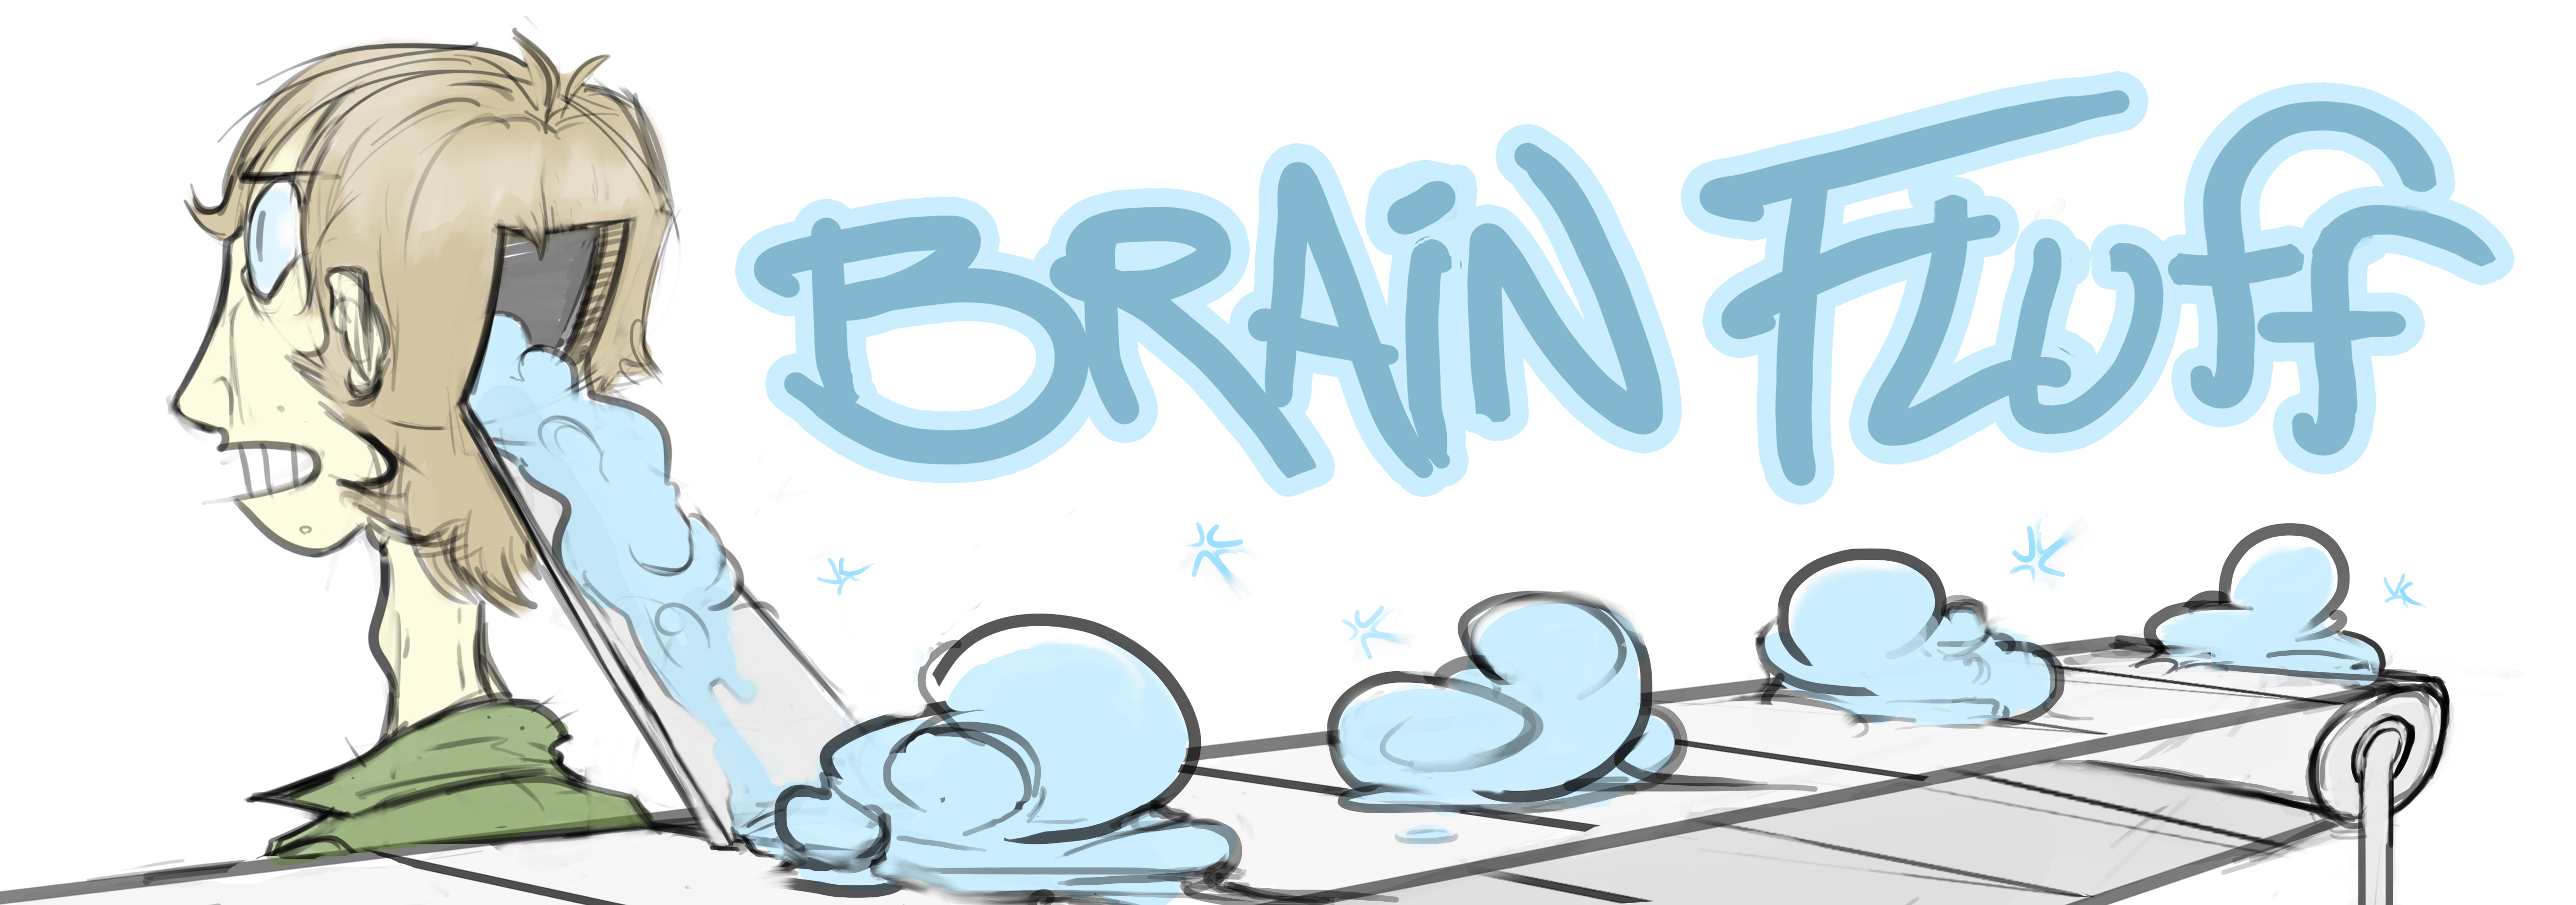 Brain Fluff